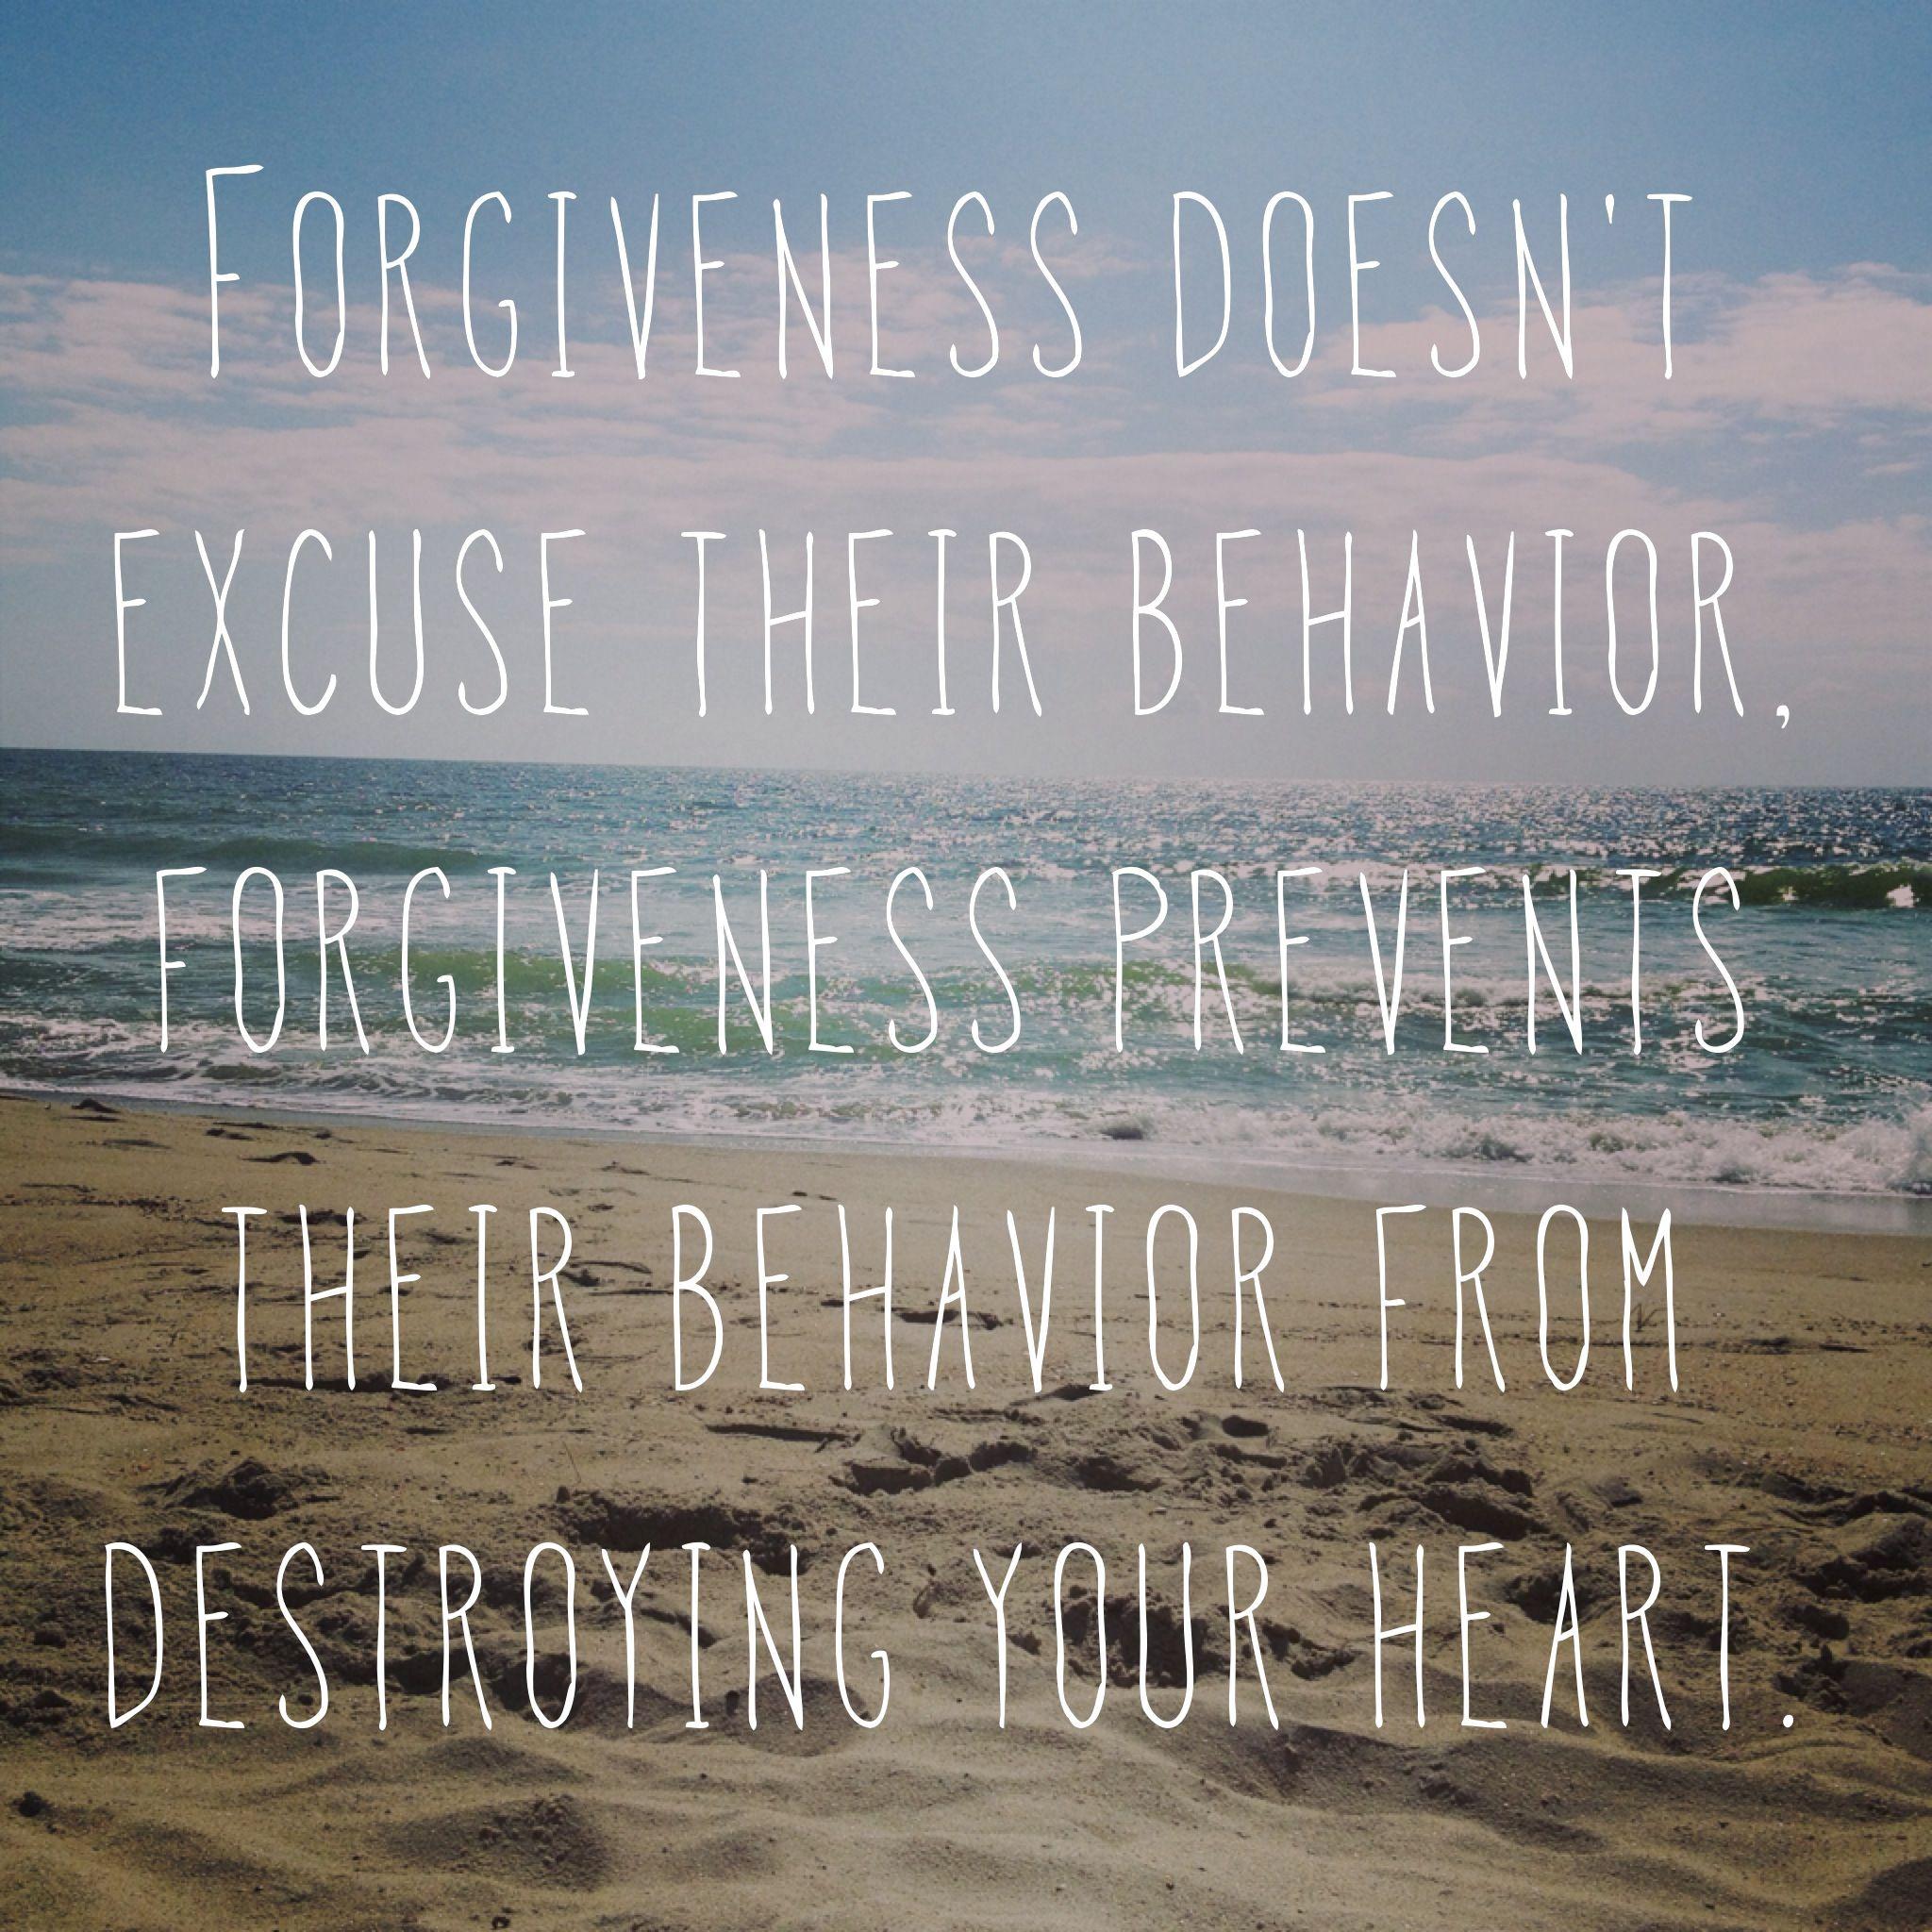 forgiveness #heart #beach #friend #quote #inspirationalquote ...